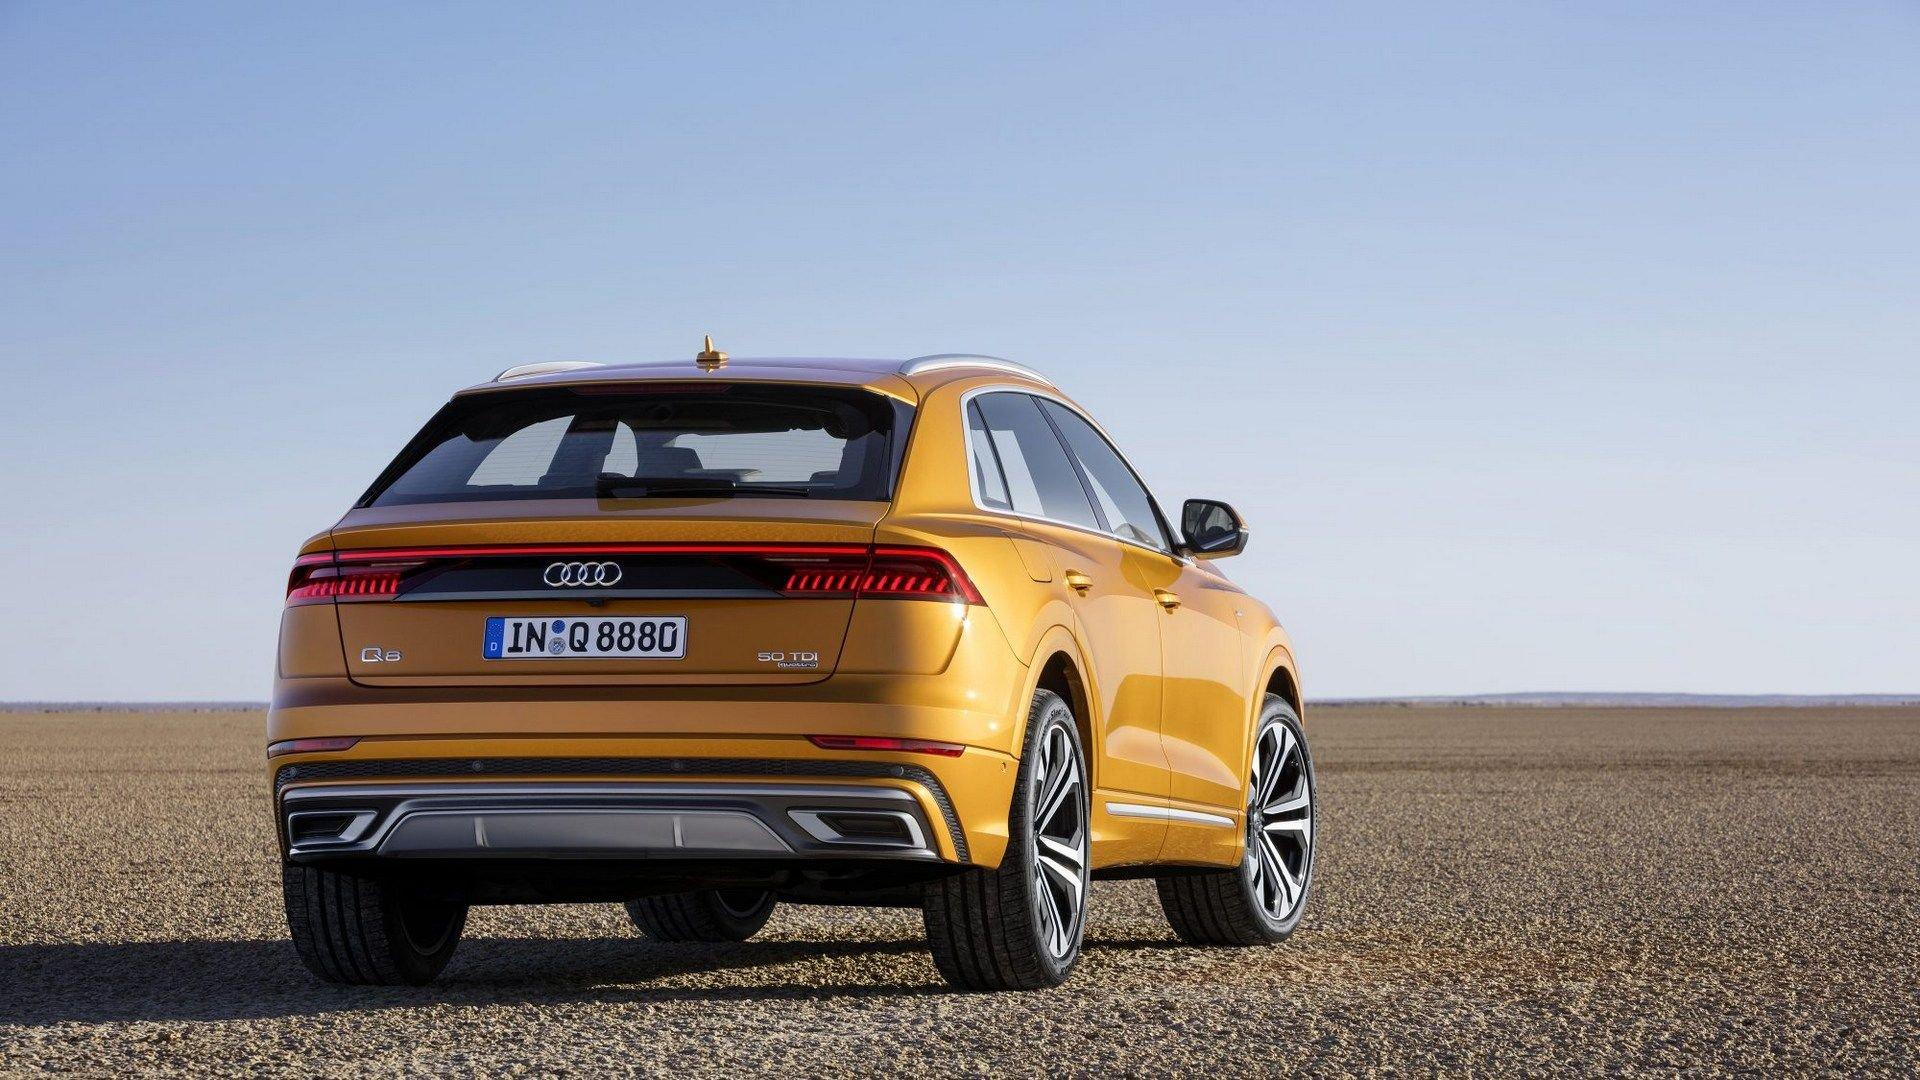 Foto vazada do Audi Q8